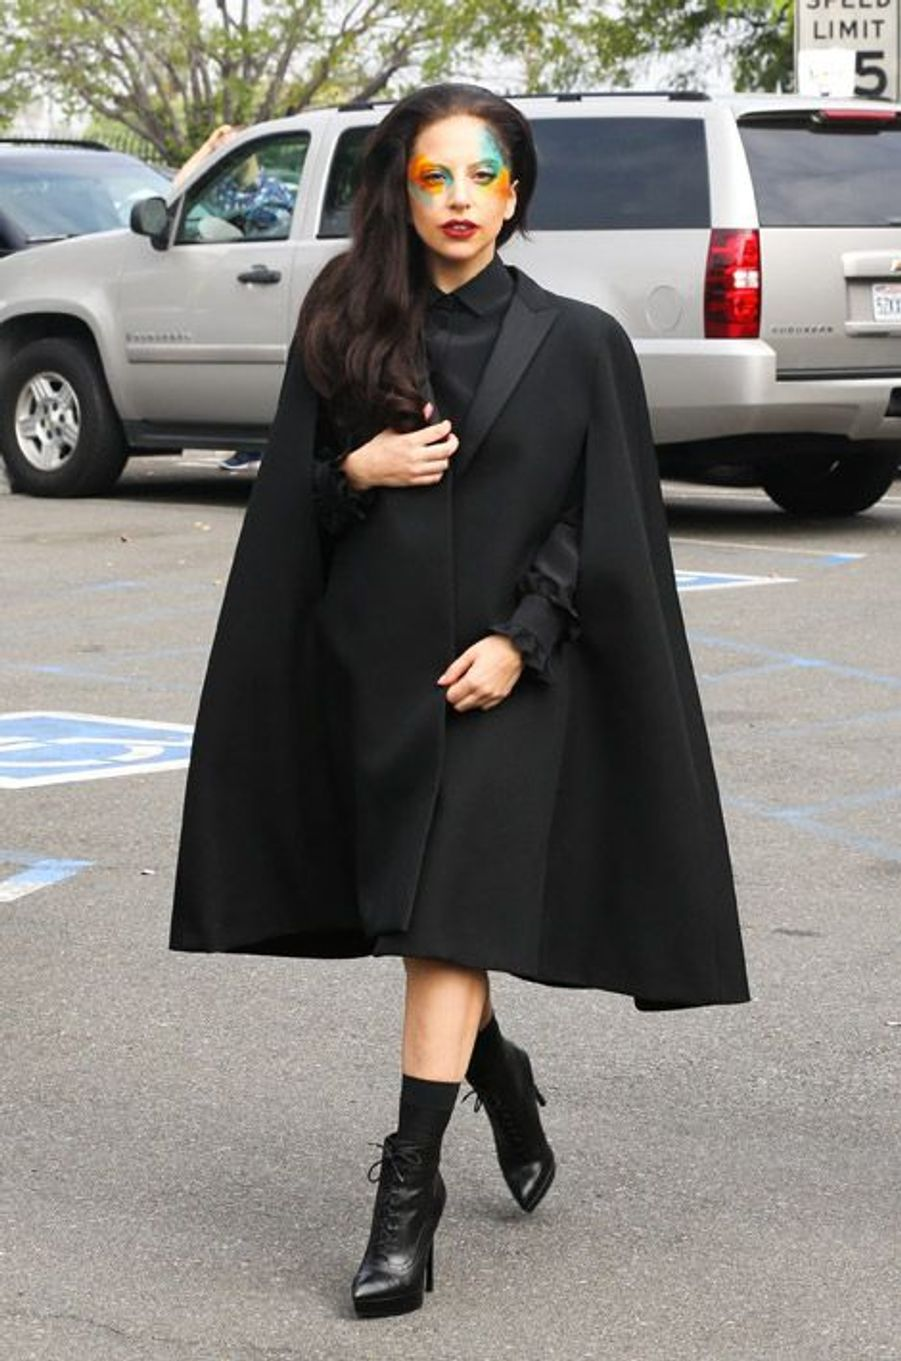 La chanteuse Lady Gagaà Los Angeles, le 13 août 2013